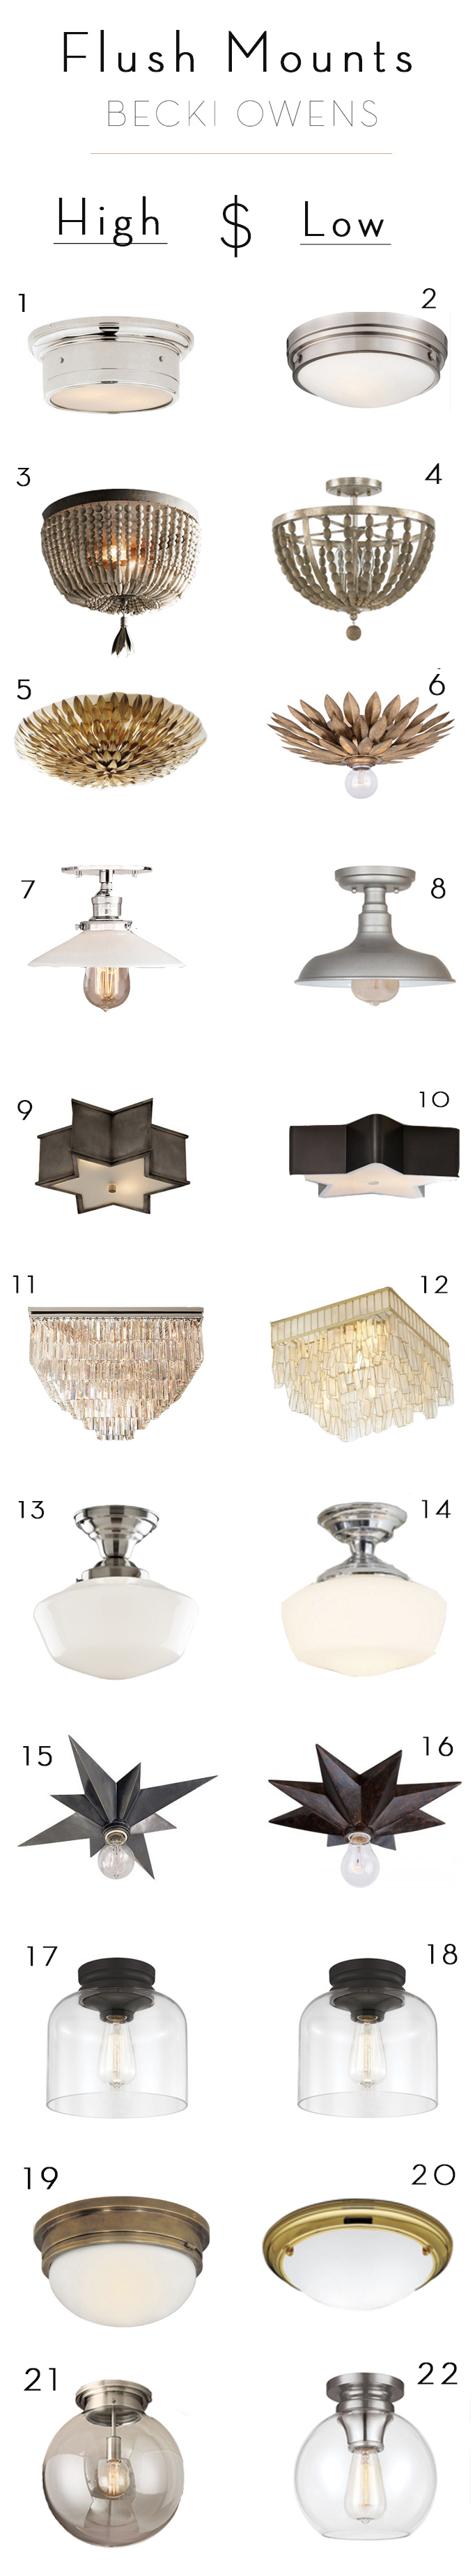 splurge and save flush mount lighting becki owens